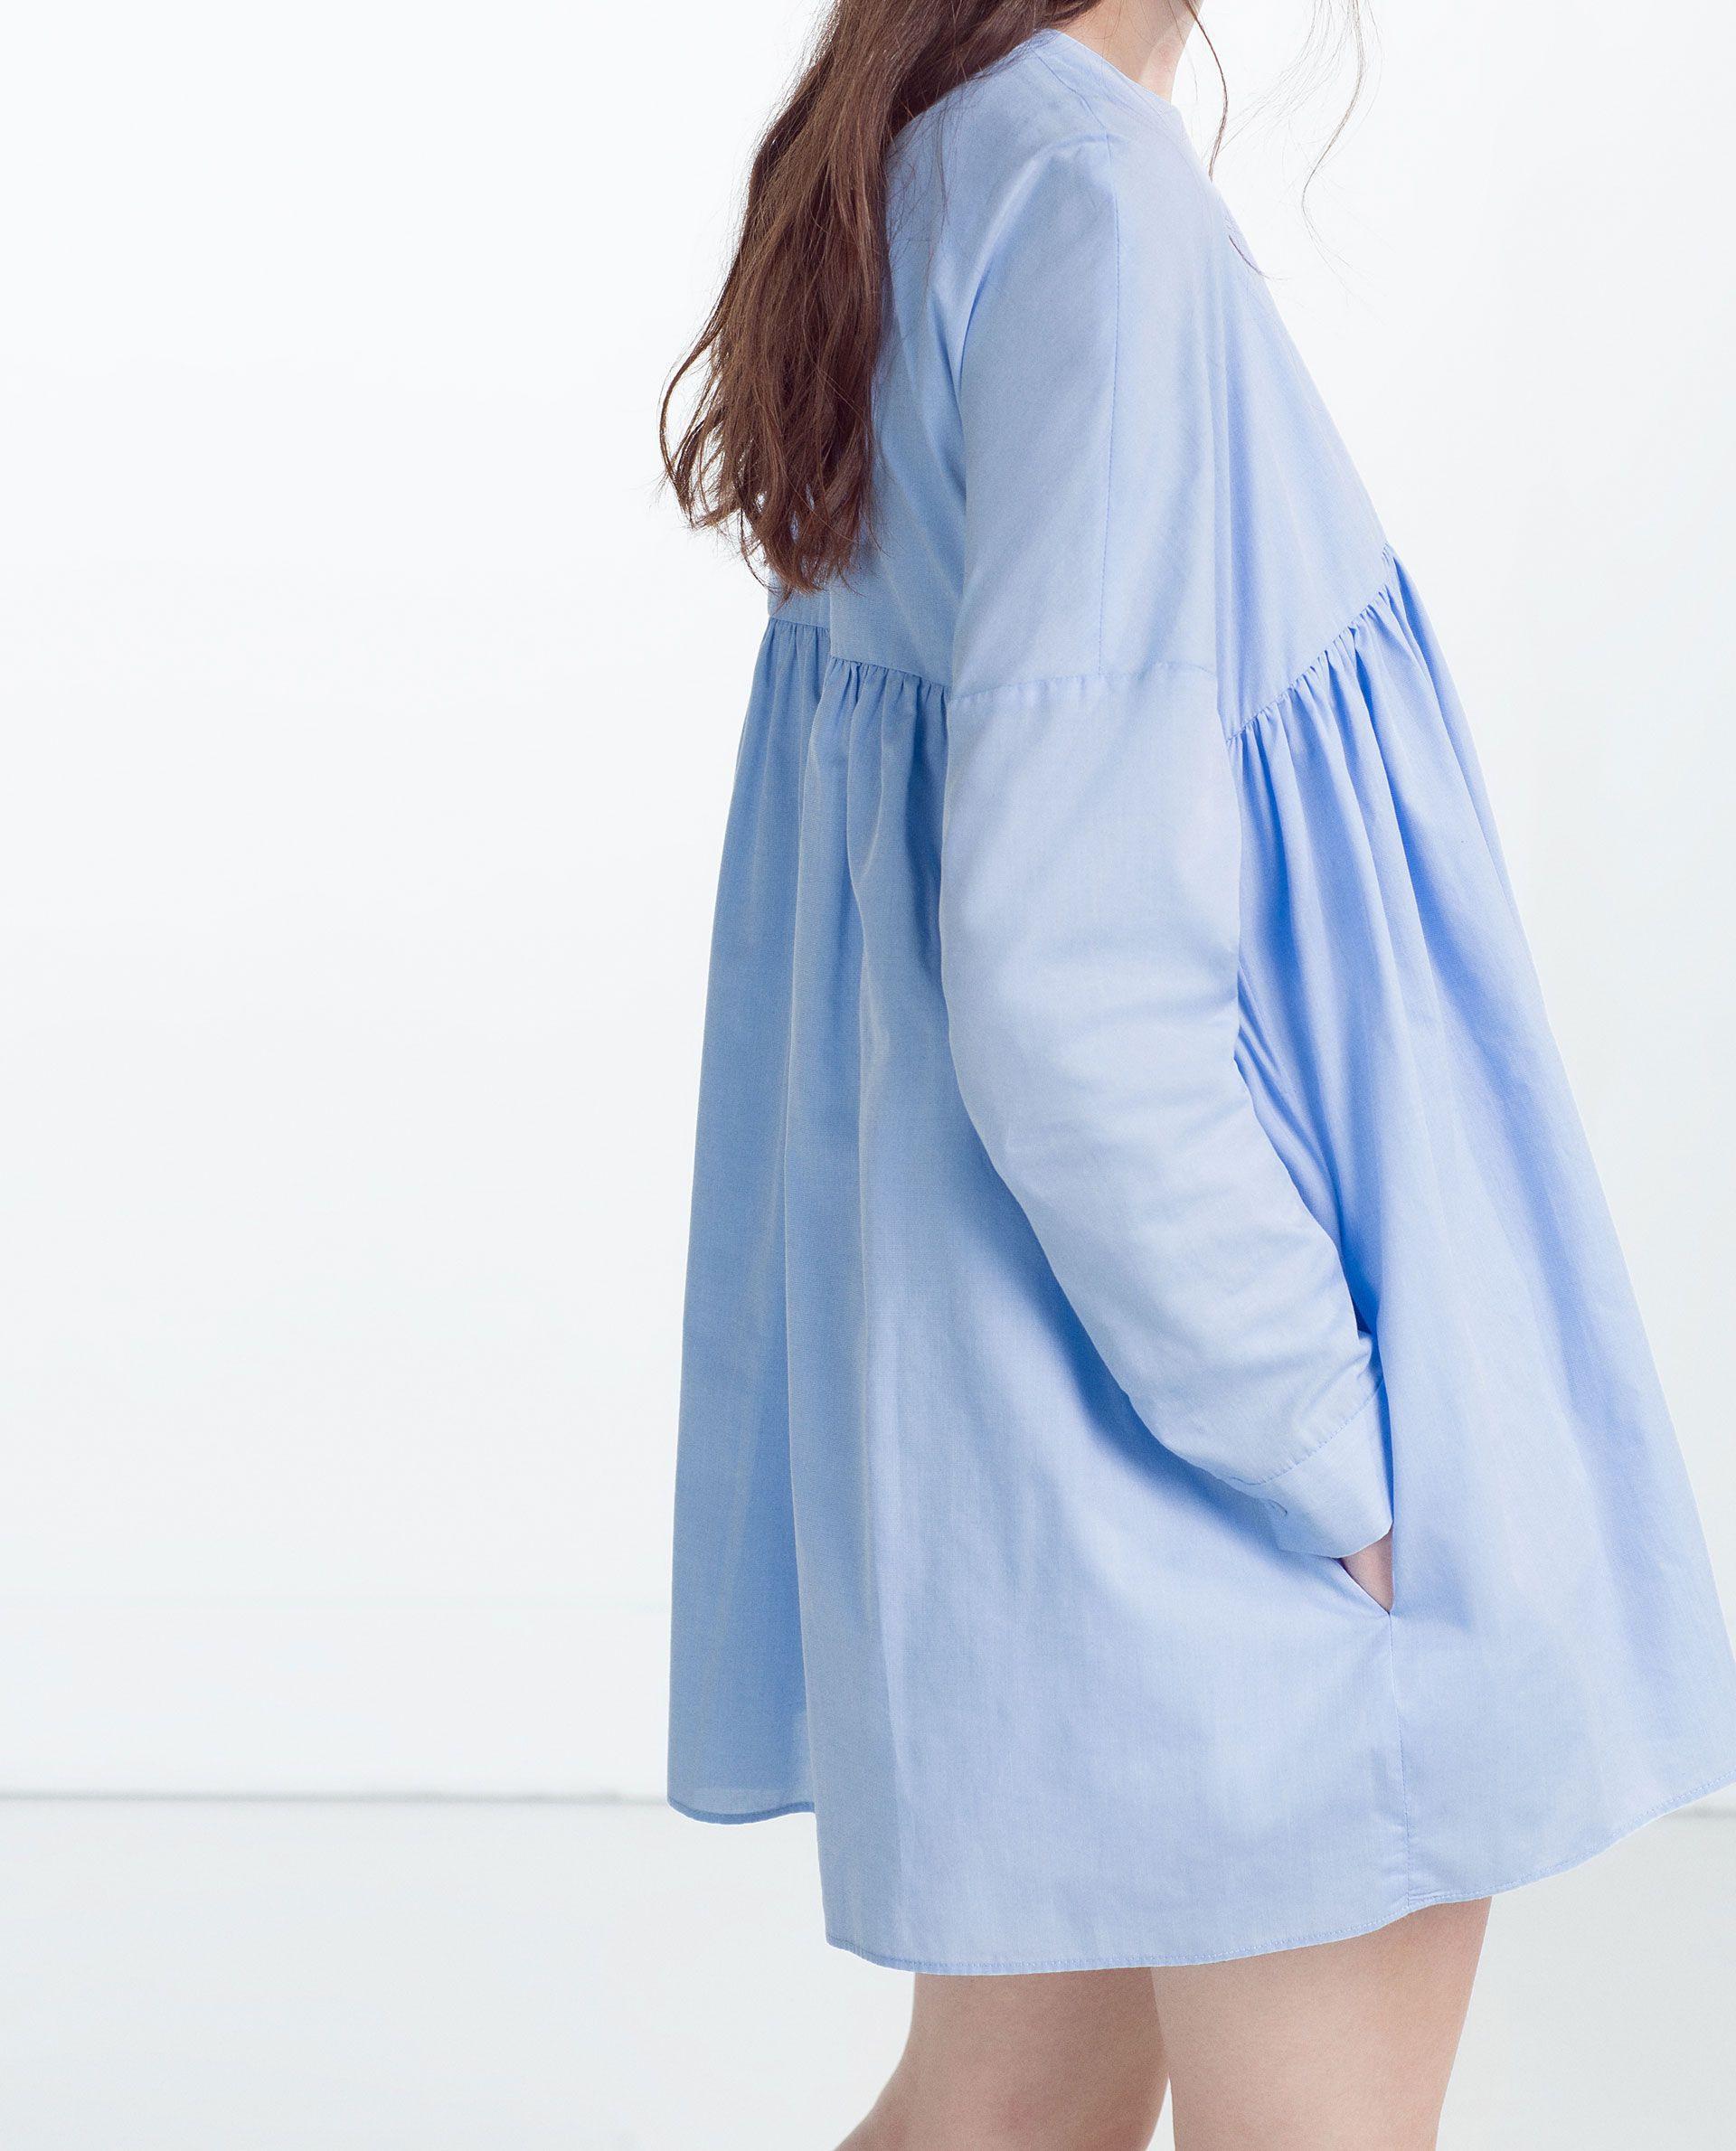 Платье  Комбинезон Из Поплина  Комбинезоны  Trf  Zara